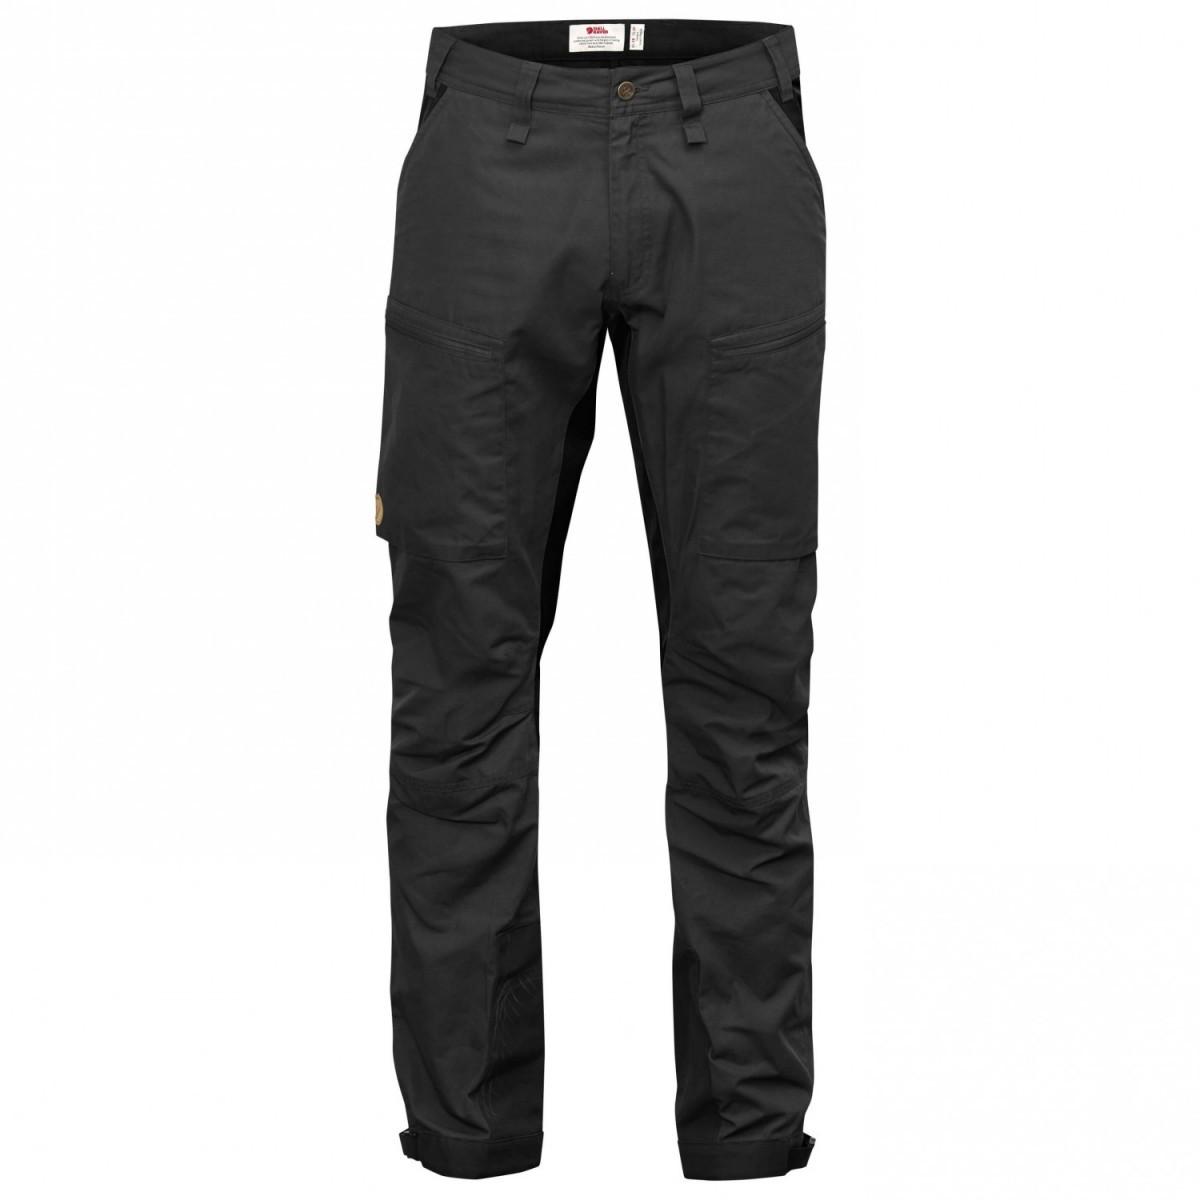 FJALLRAVEN フェールラーベン Abisko Lite Trekking Trousers パンツ (Dark Grey)